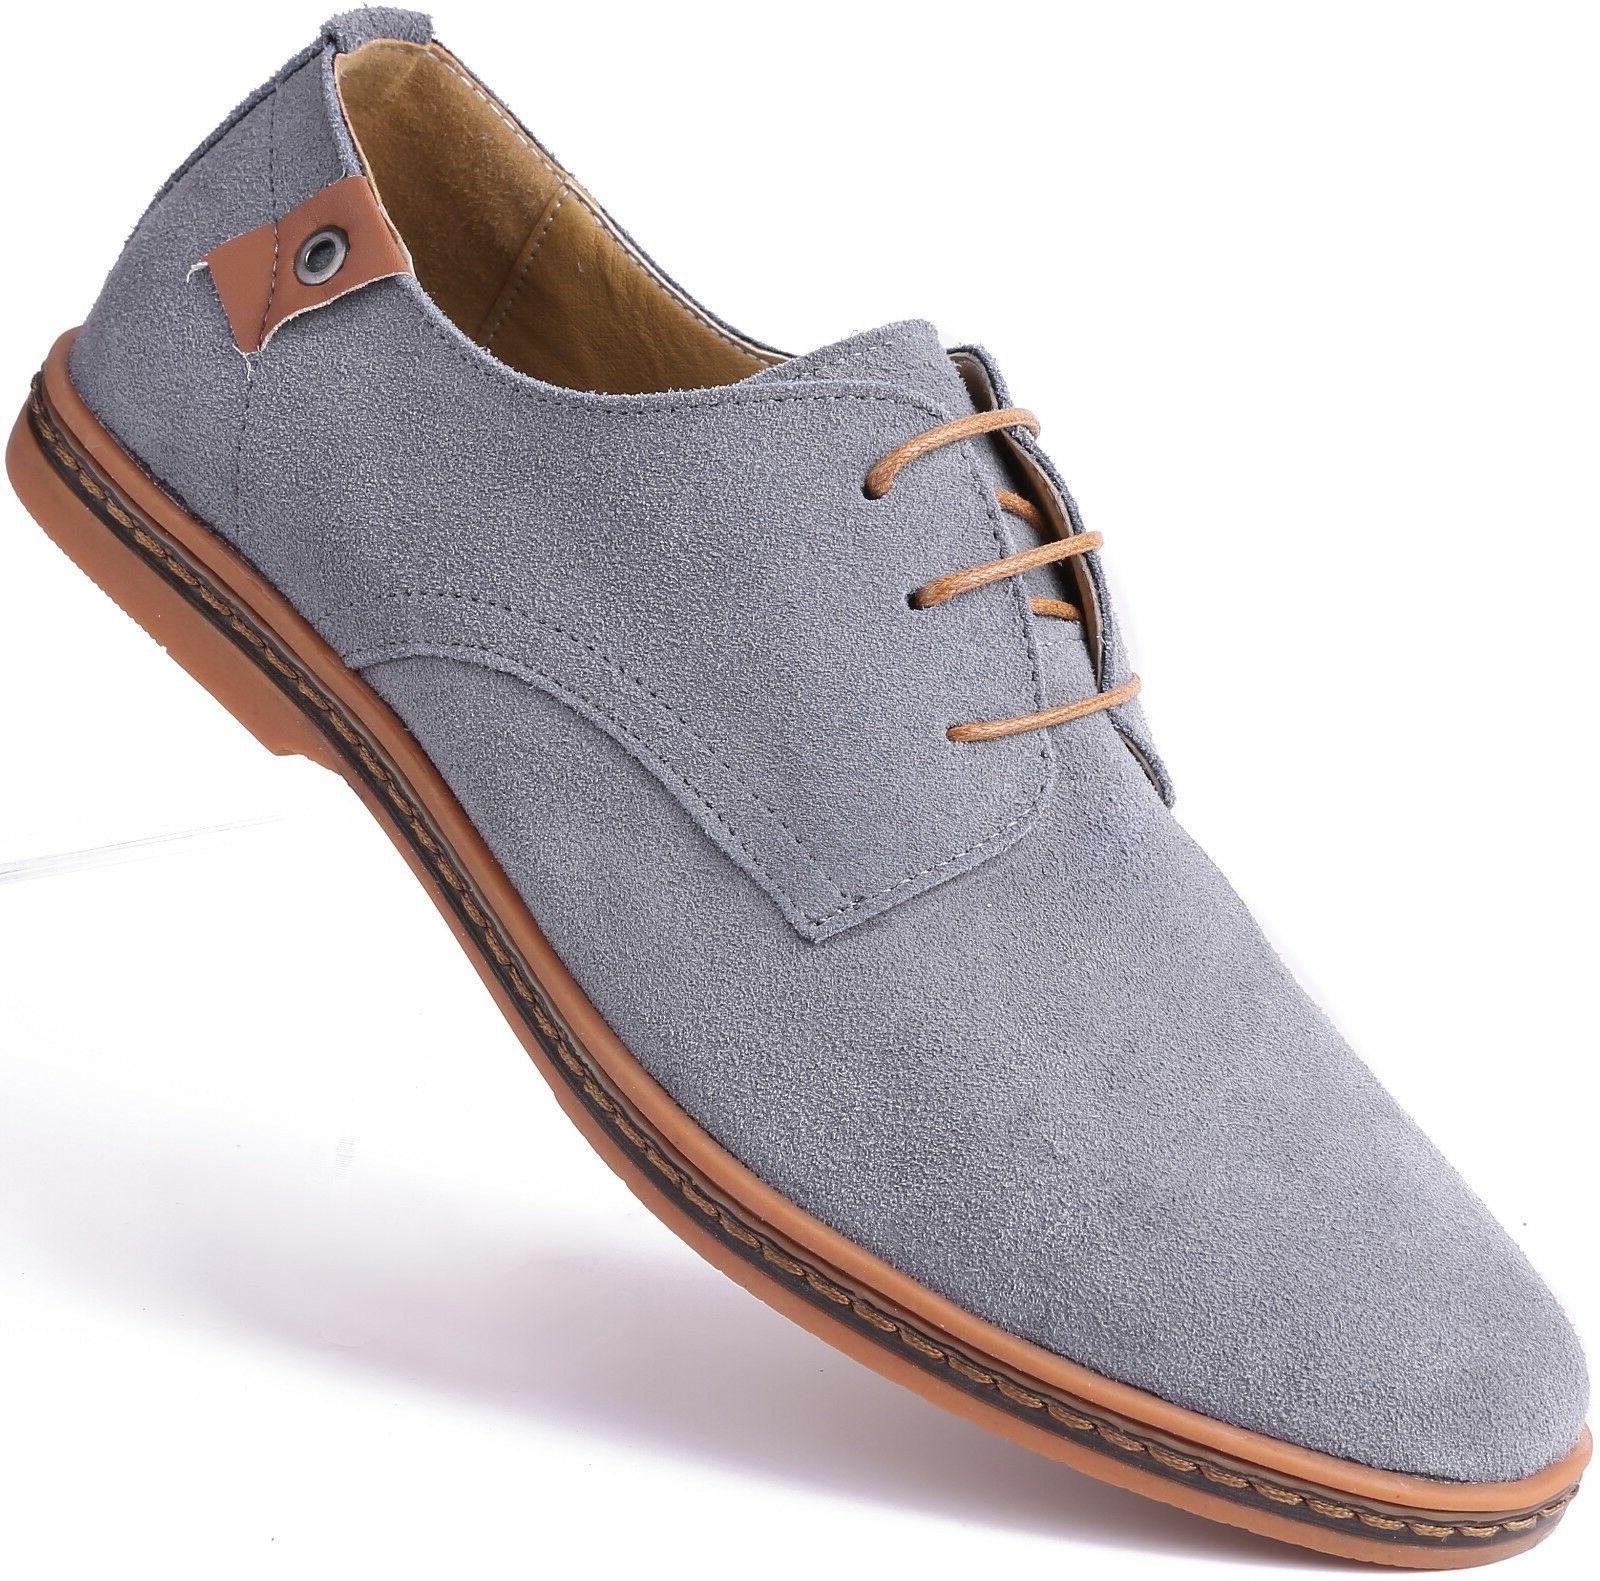 Marino Shoes for Business Classic Tuxedo